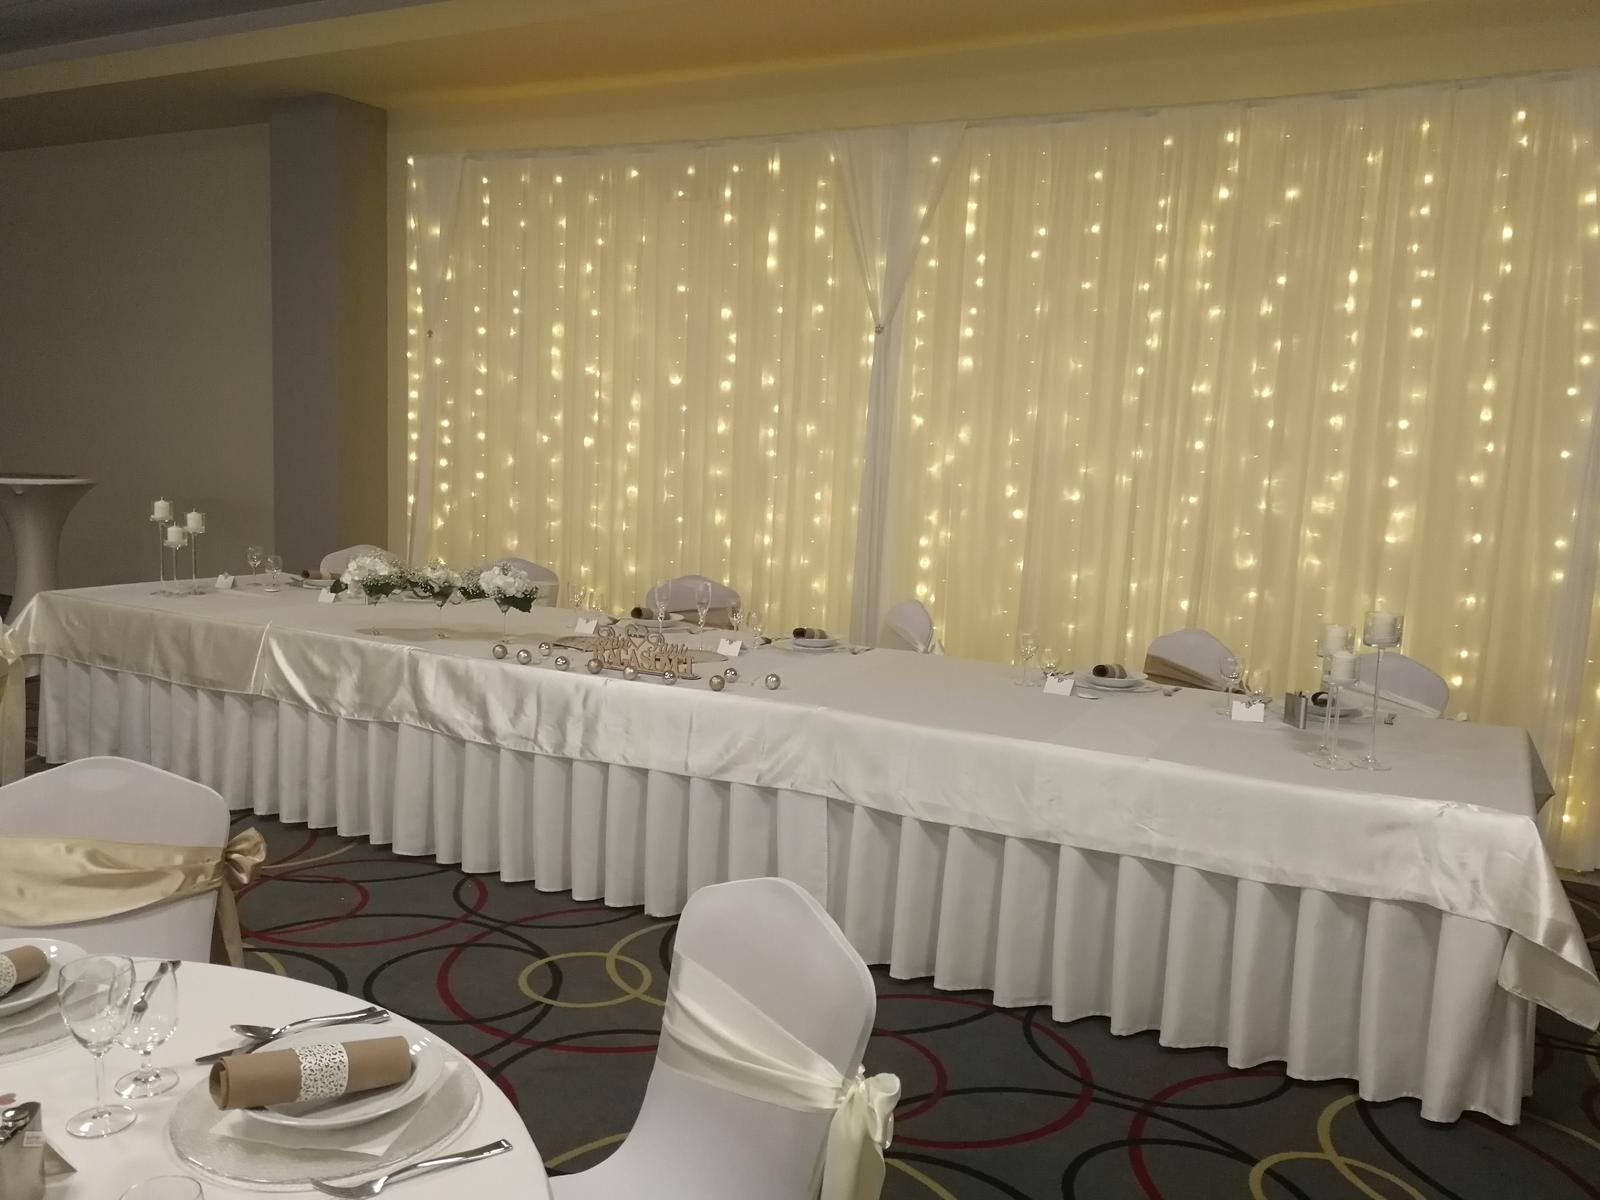 Svadba 7.4.2018 Zvolen Hotel TENIS - Obrázok č. 22